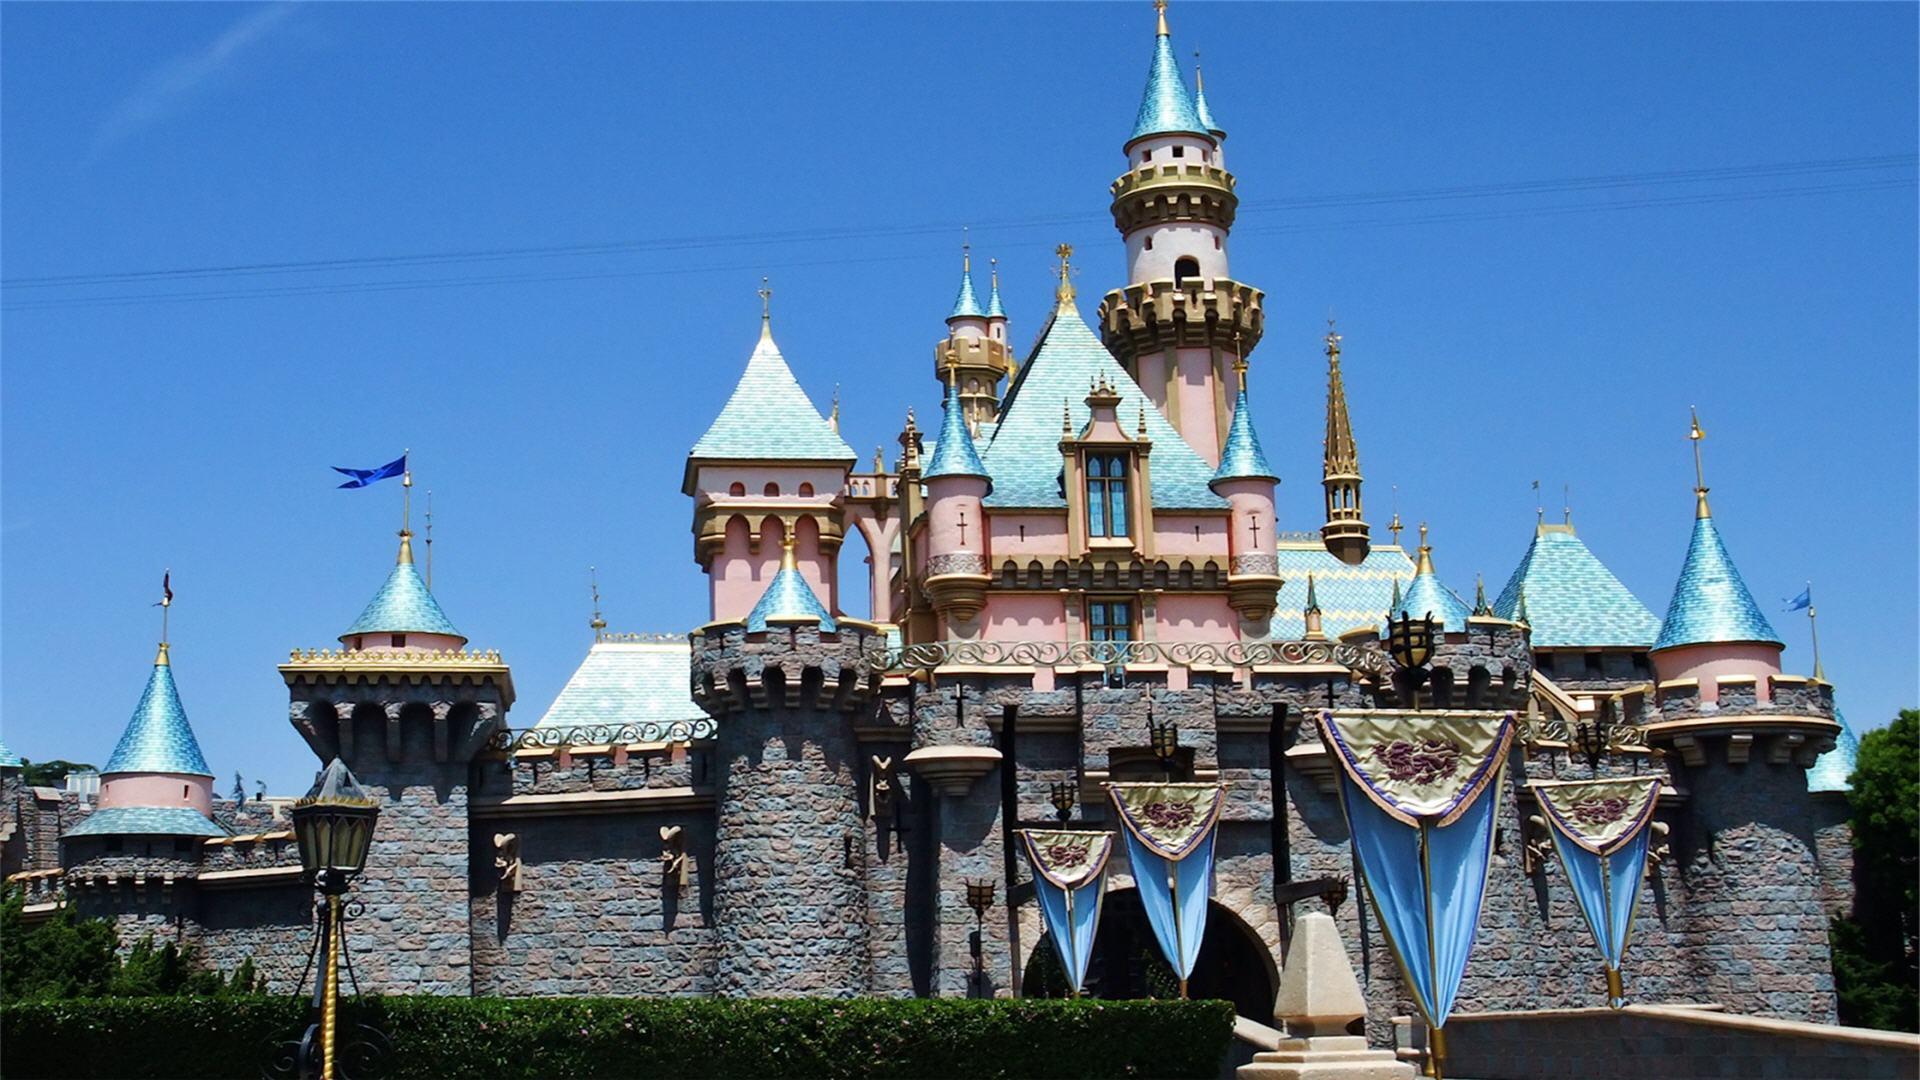 Disney Castle Wallpaper HD - WallpaperSafari